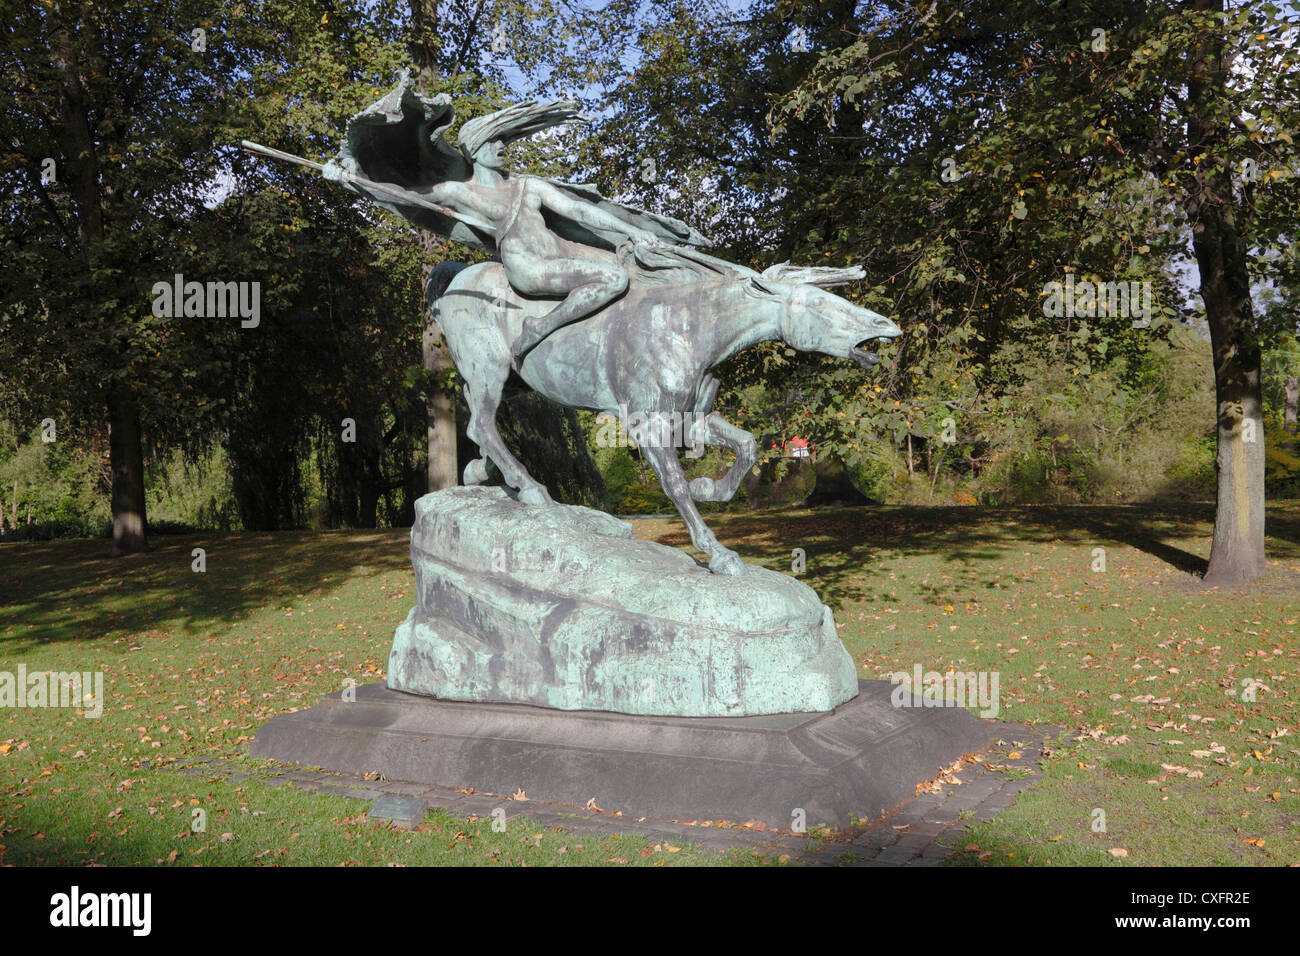 the valkyrie bronze statue in churchill park at groenningen in